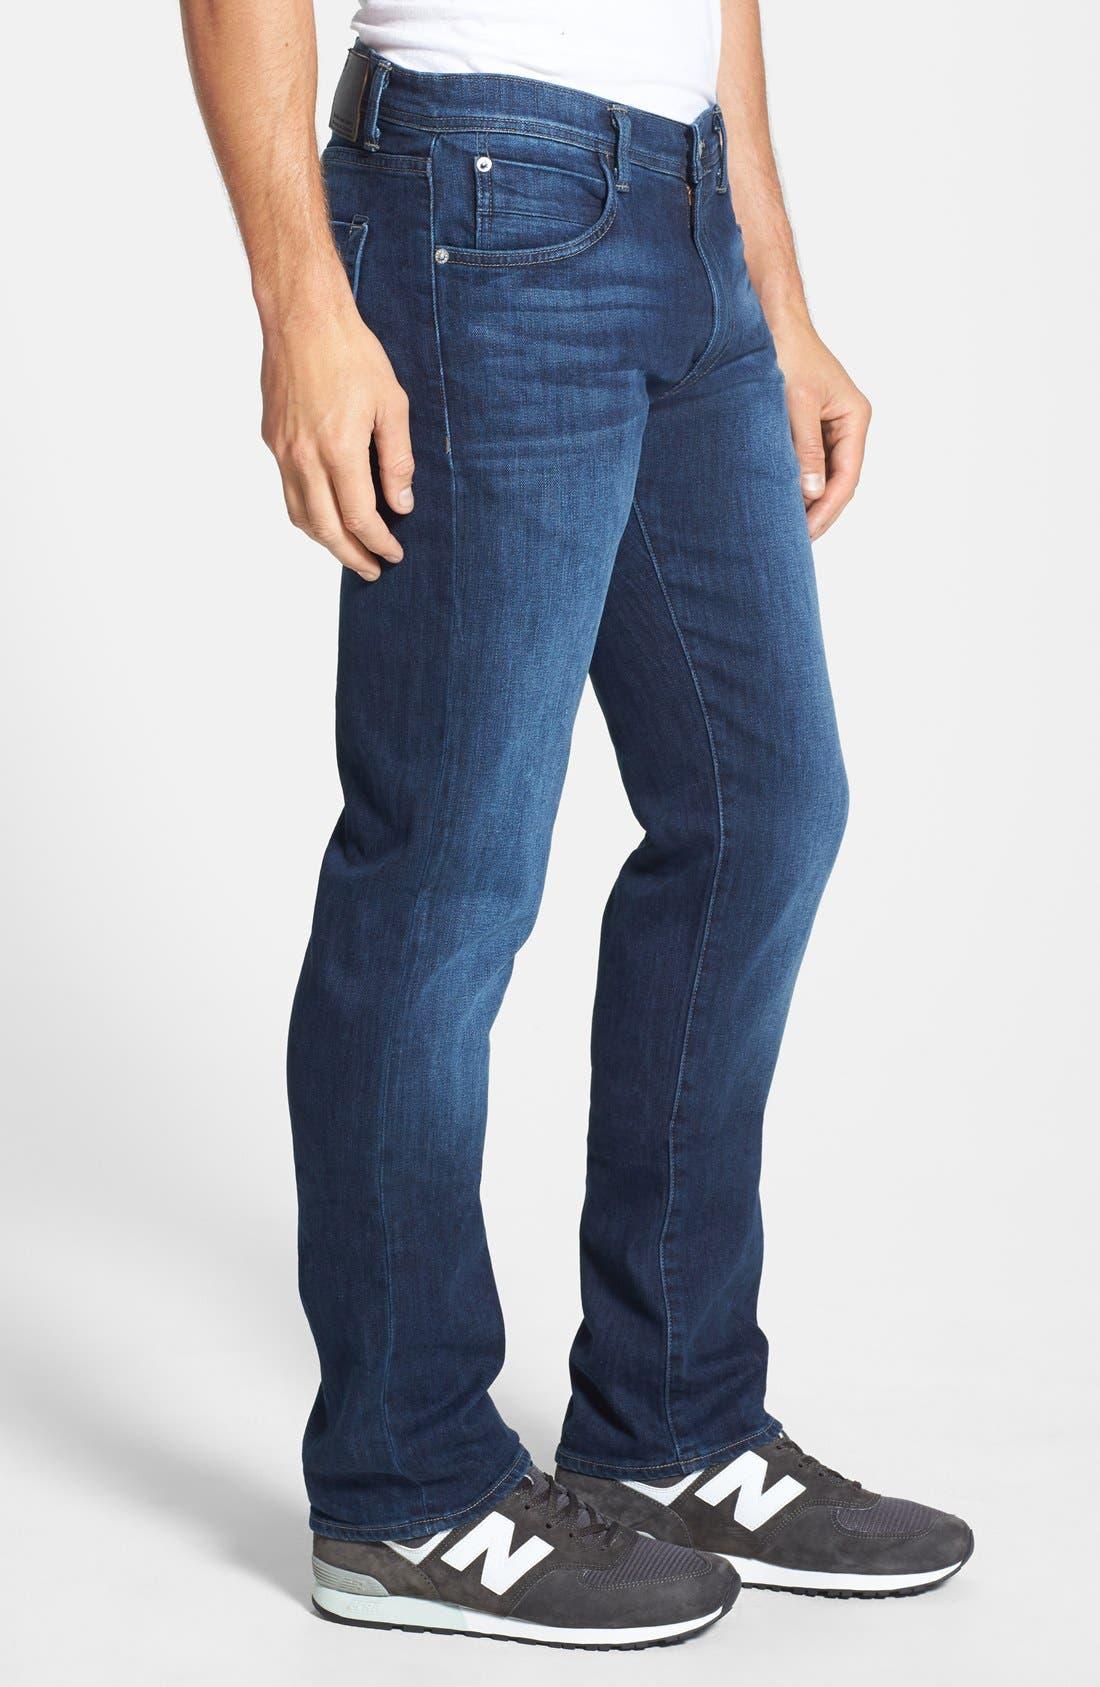 'Pragmatist Big Drake 4 Year Flex' Straight Leg Italian Stretch Denim Jeans,                             Alternate thumbnail 4, color,                             421